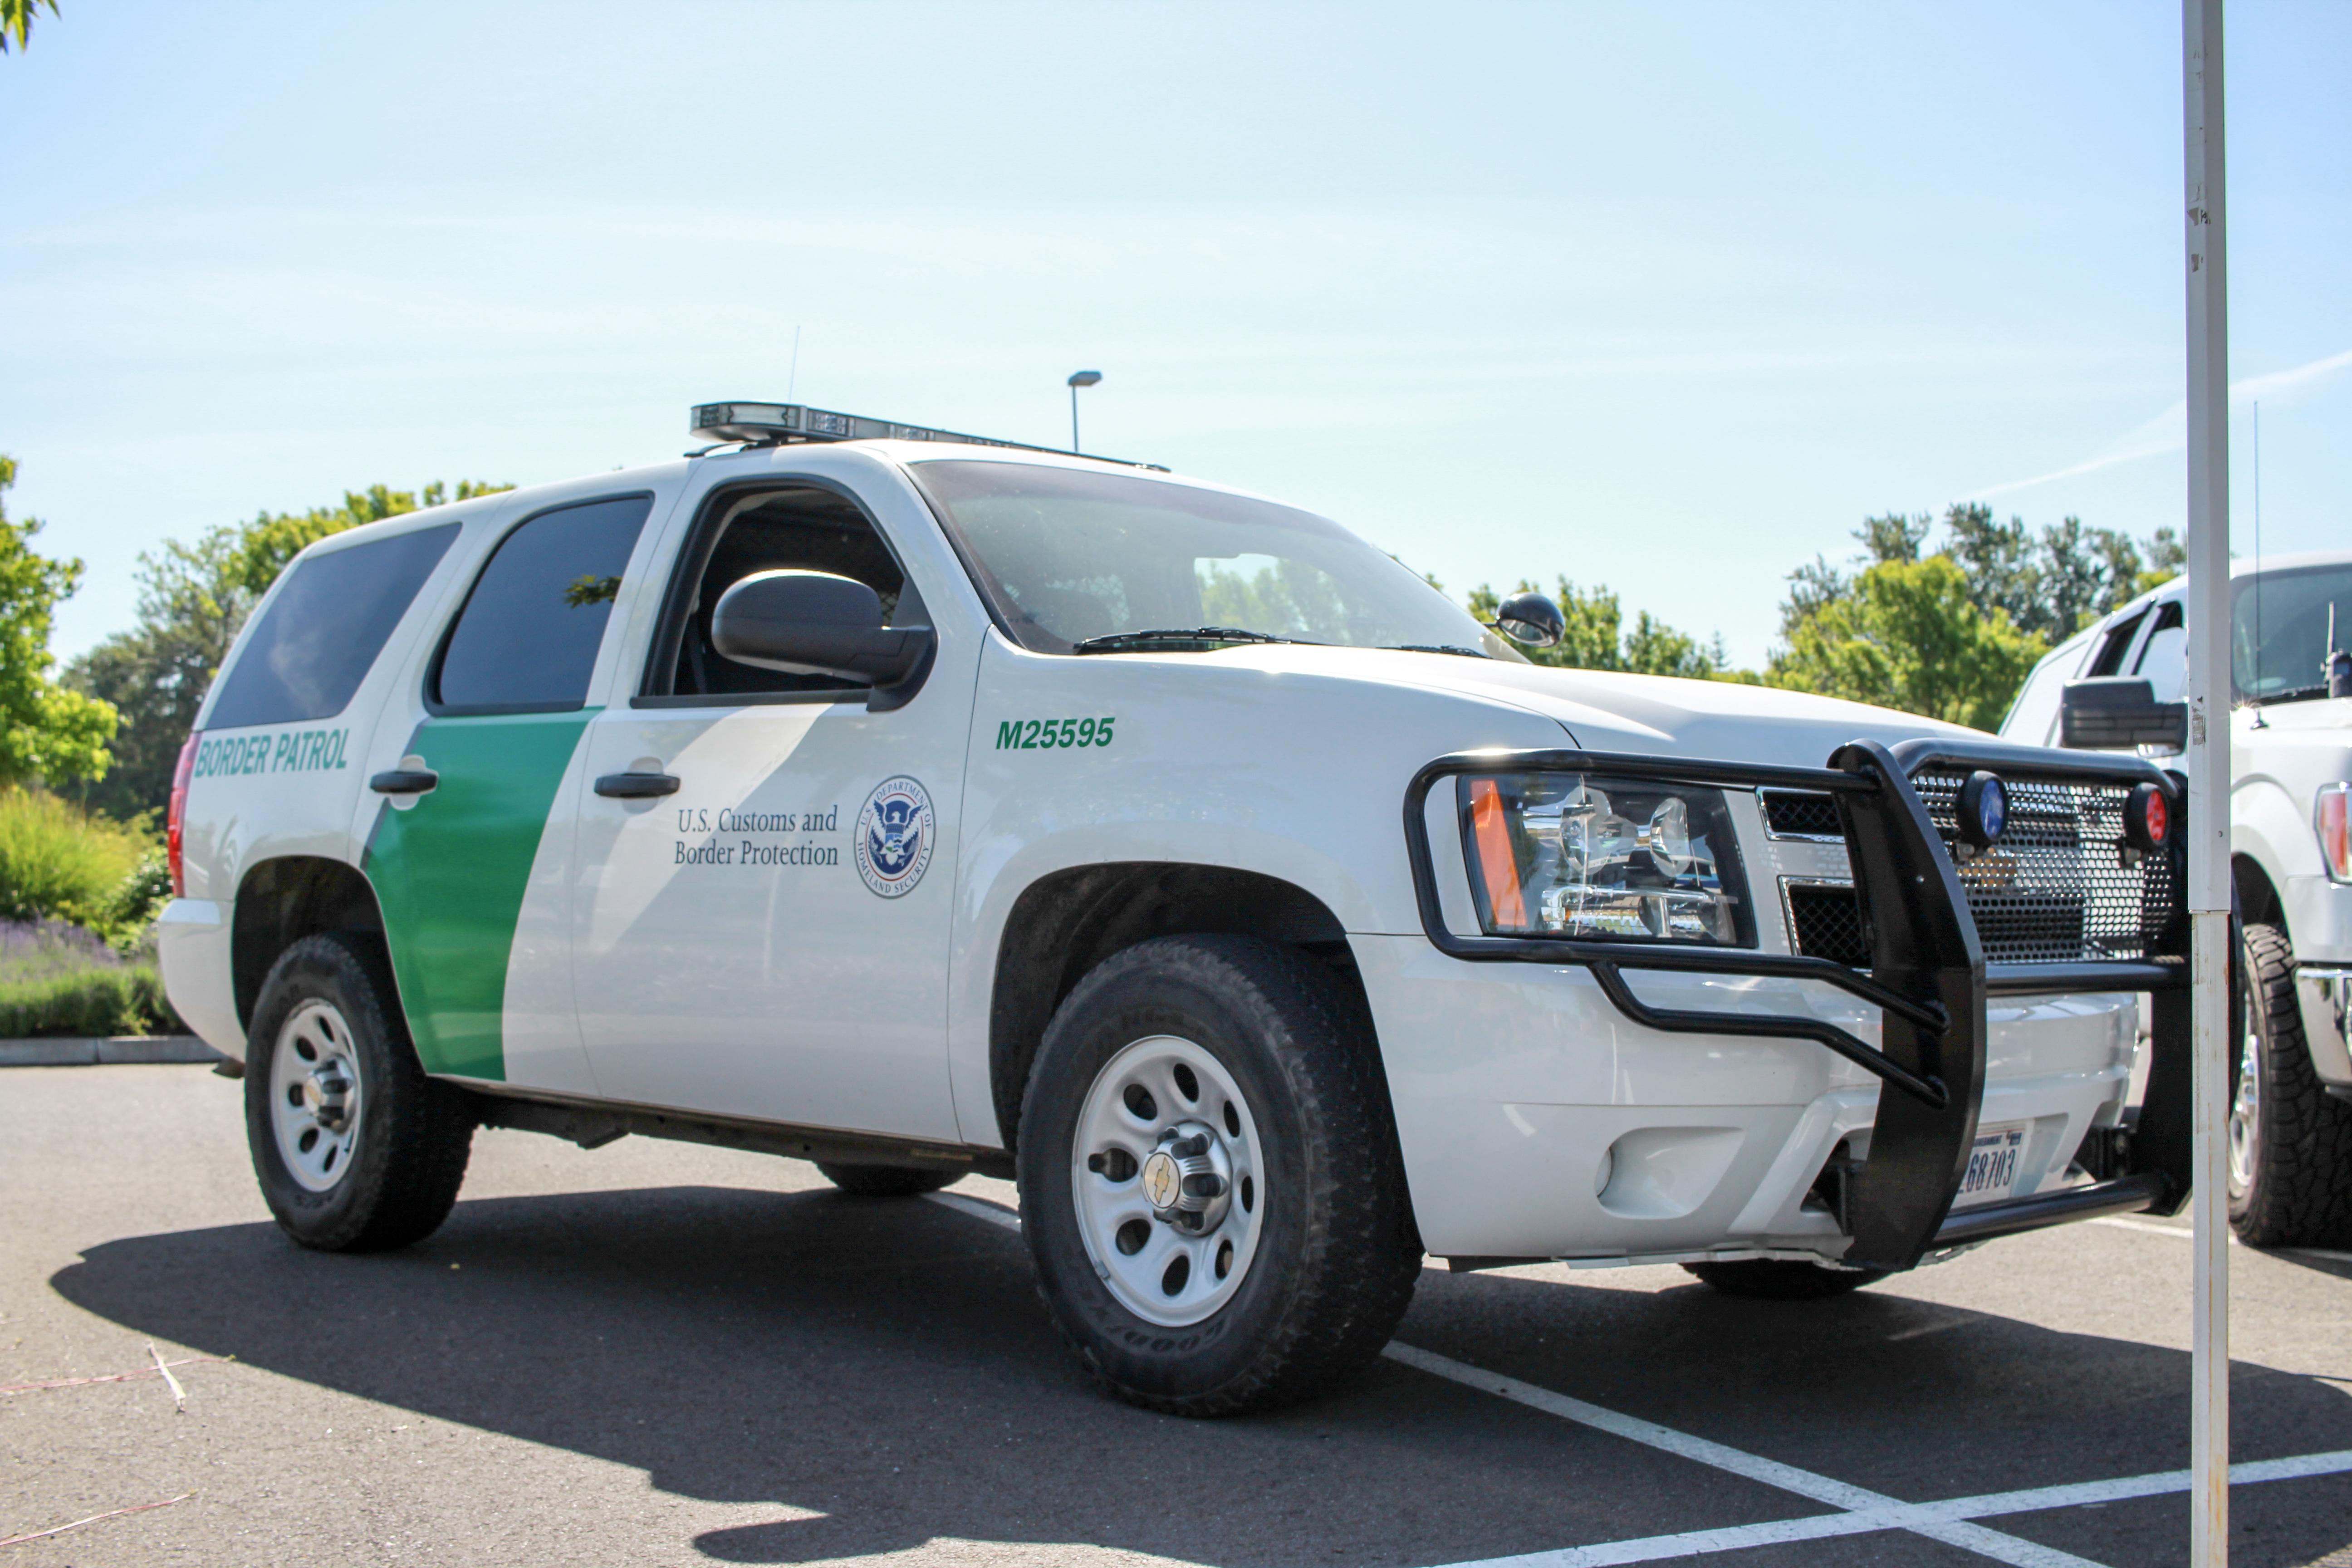 Border patrol chevrolet tahoe photo